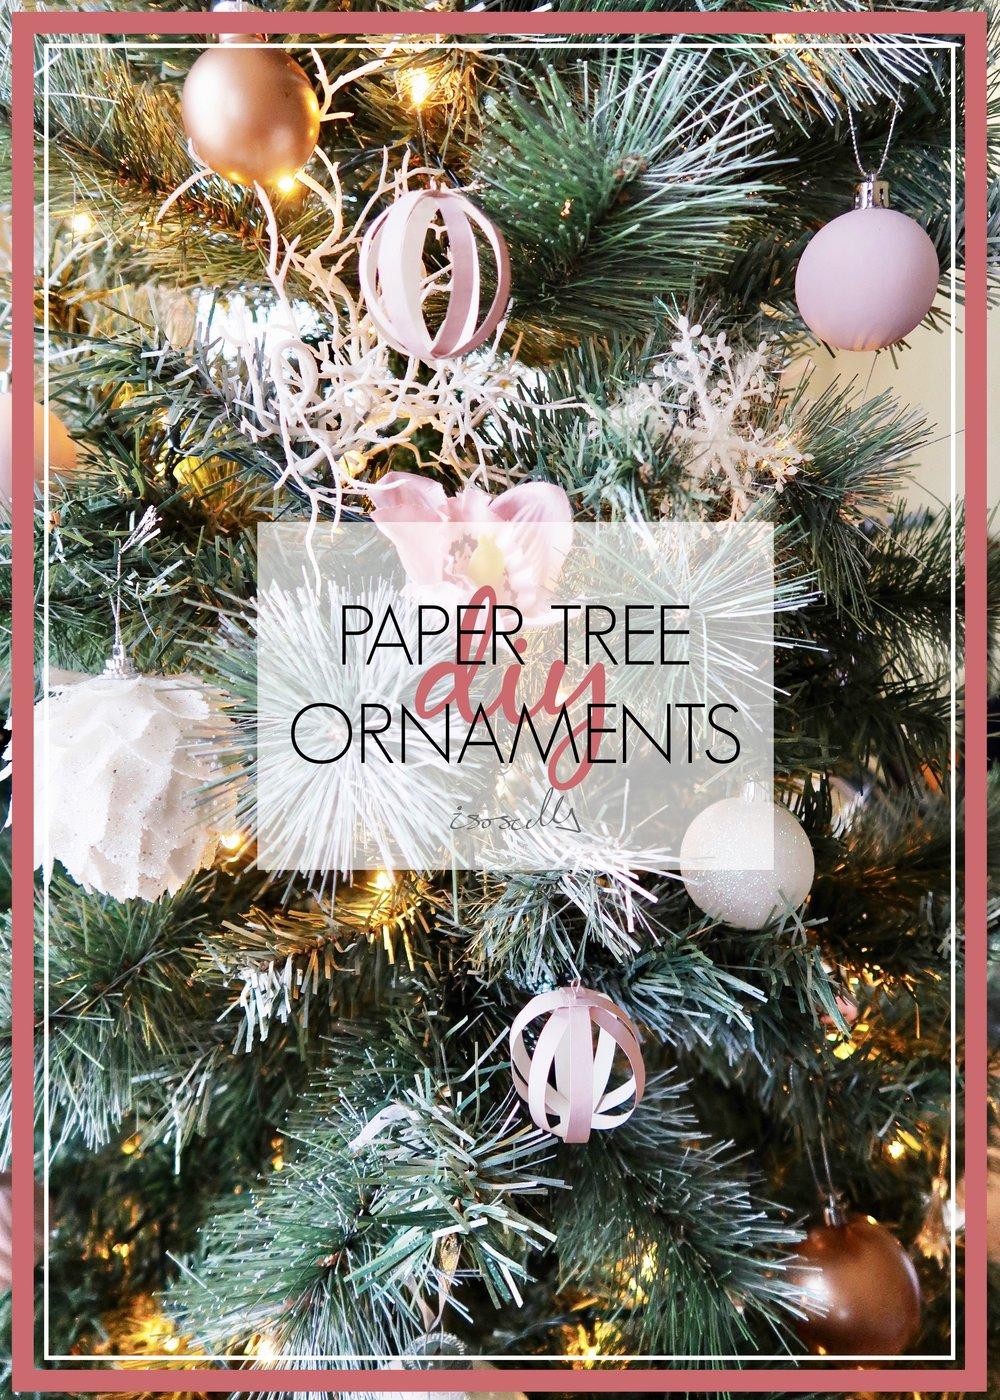 DIY Paper Tree Ornaments by Isoscella